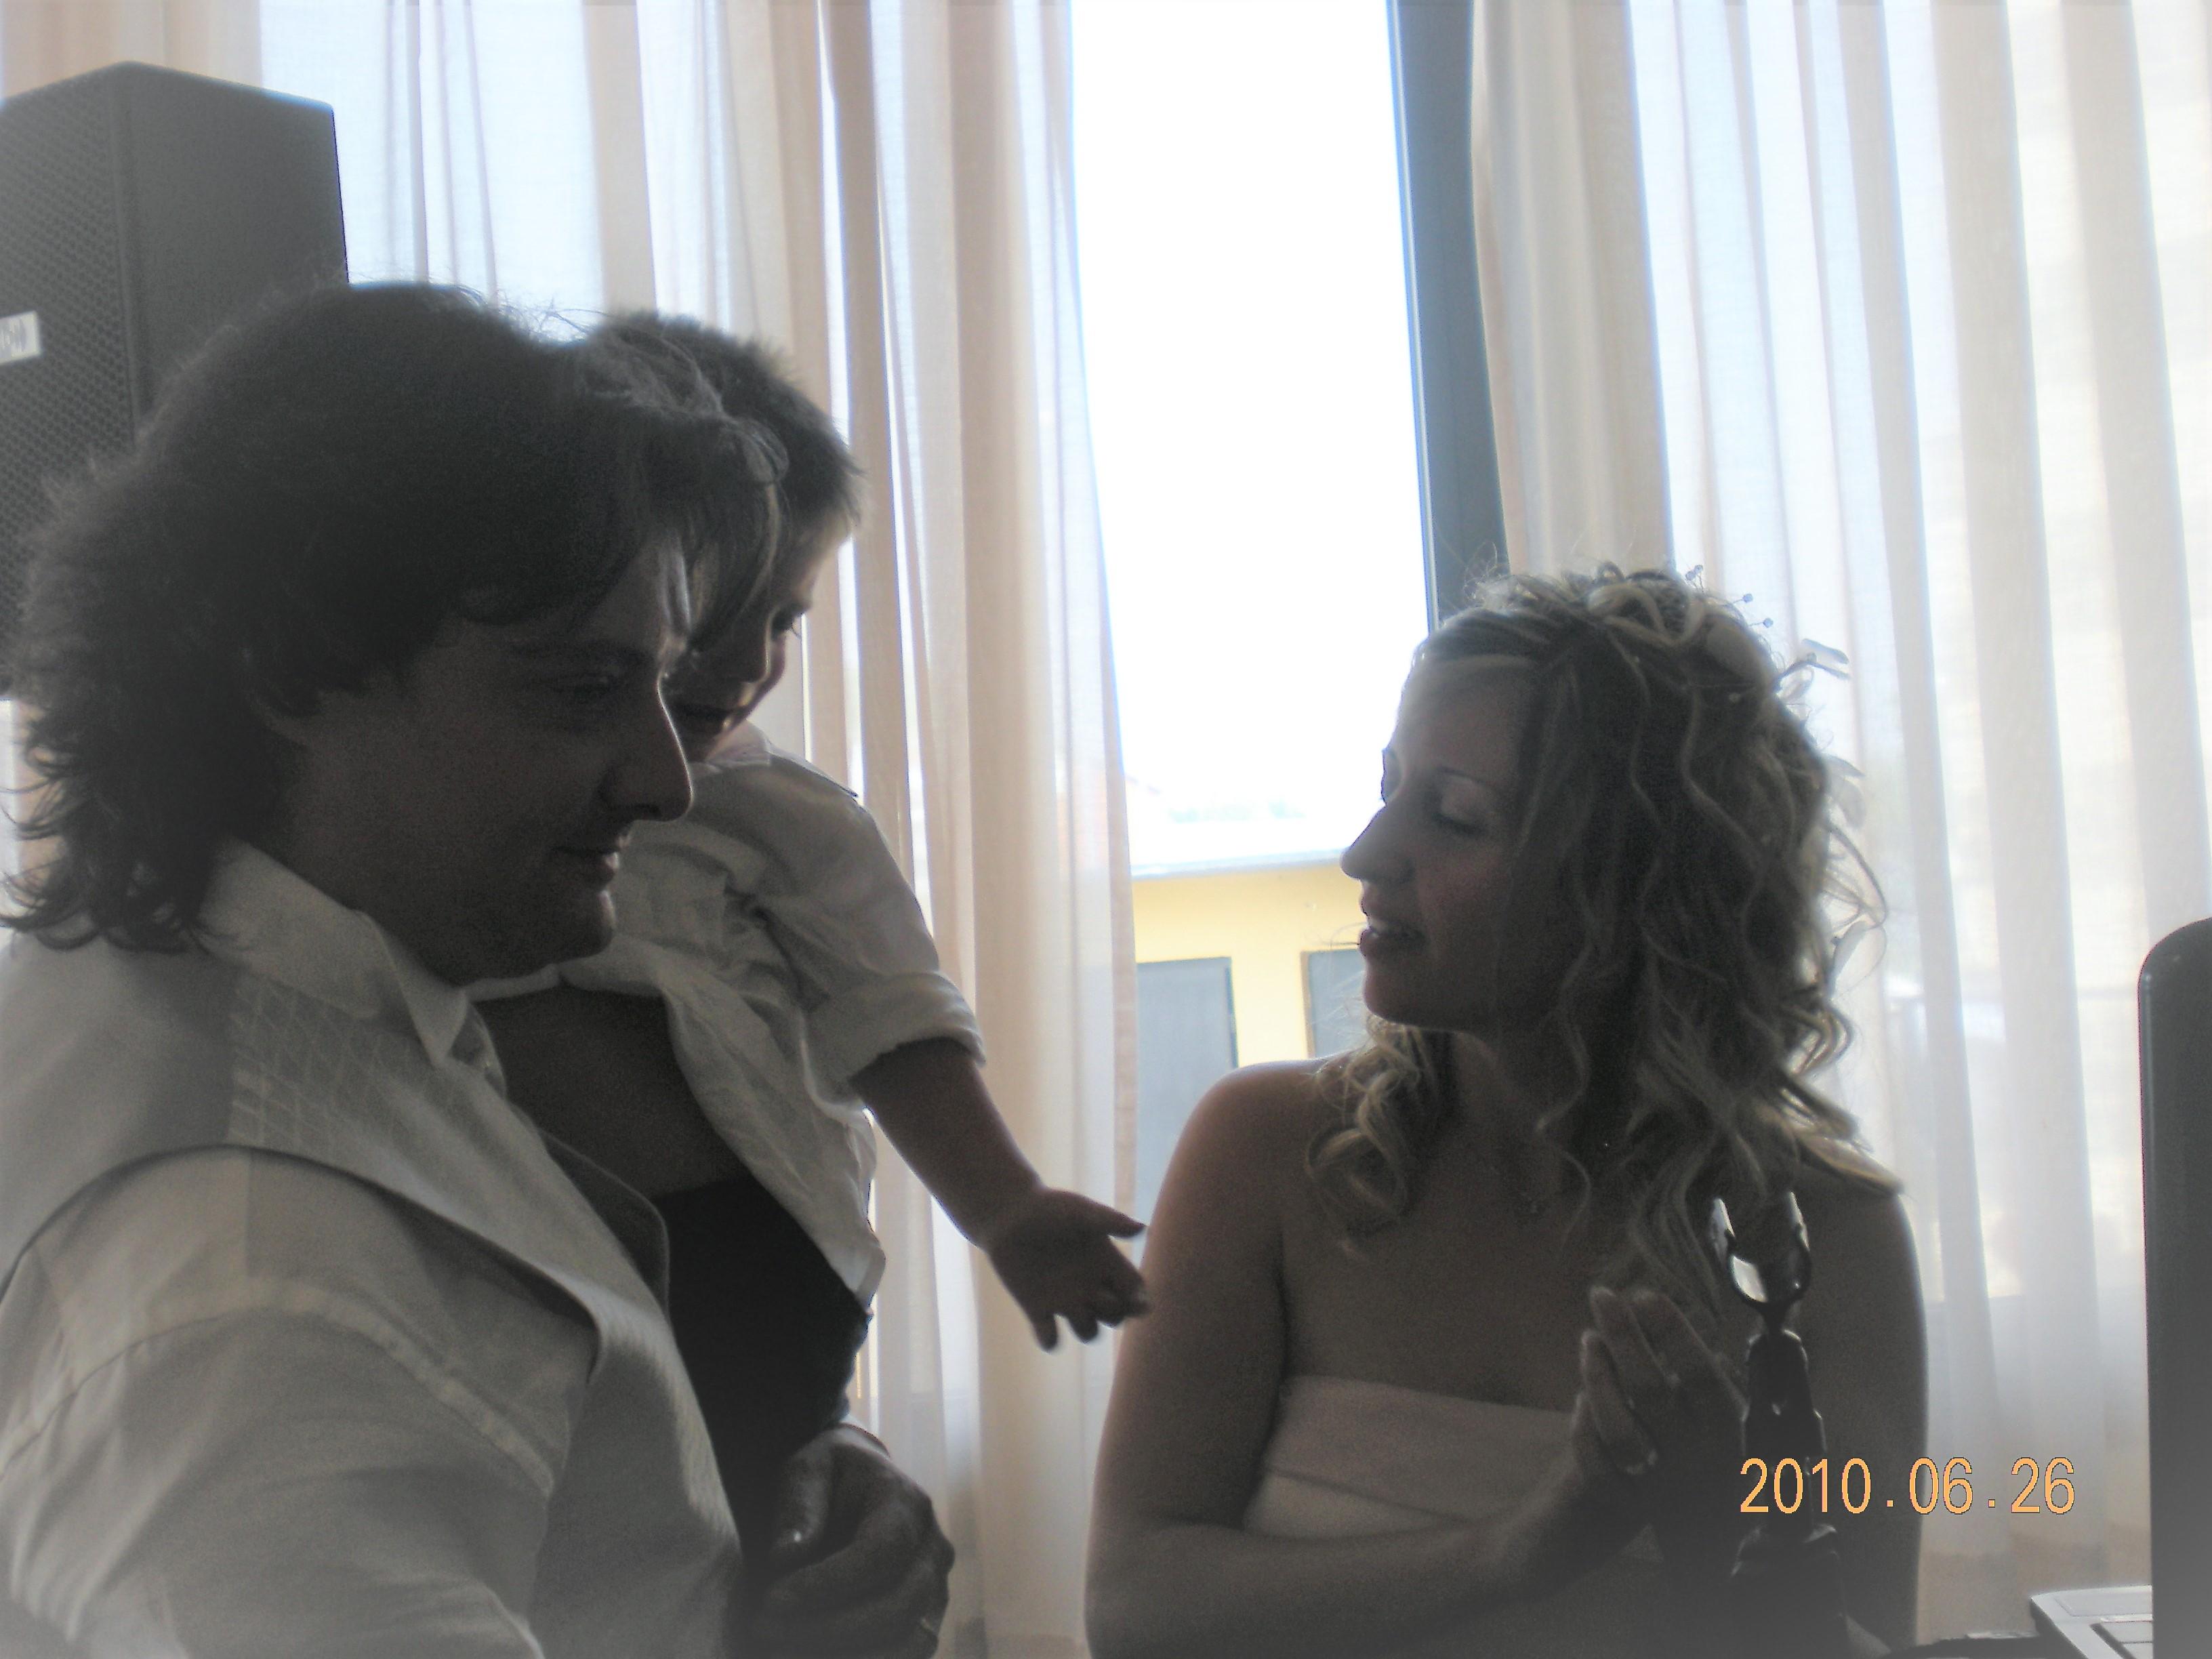 Francesco e Rosanna - 26.06.2010 - 037.JPG